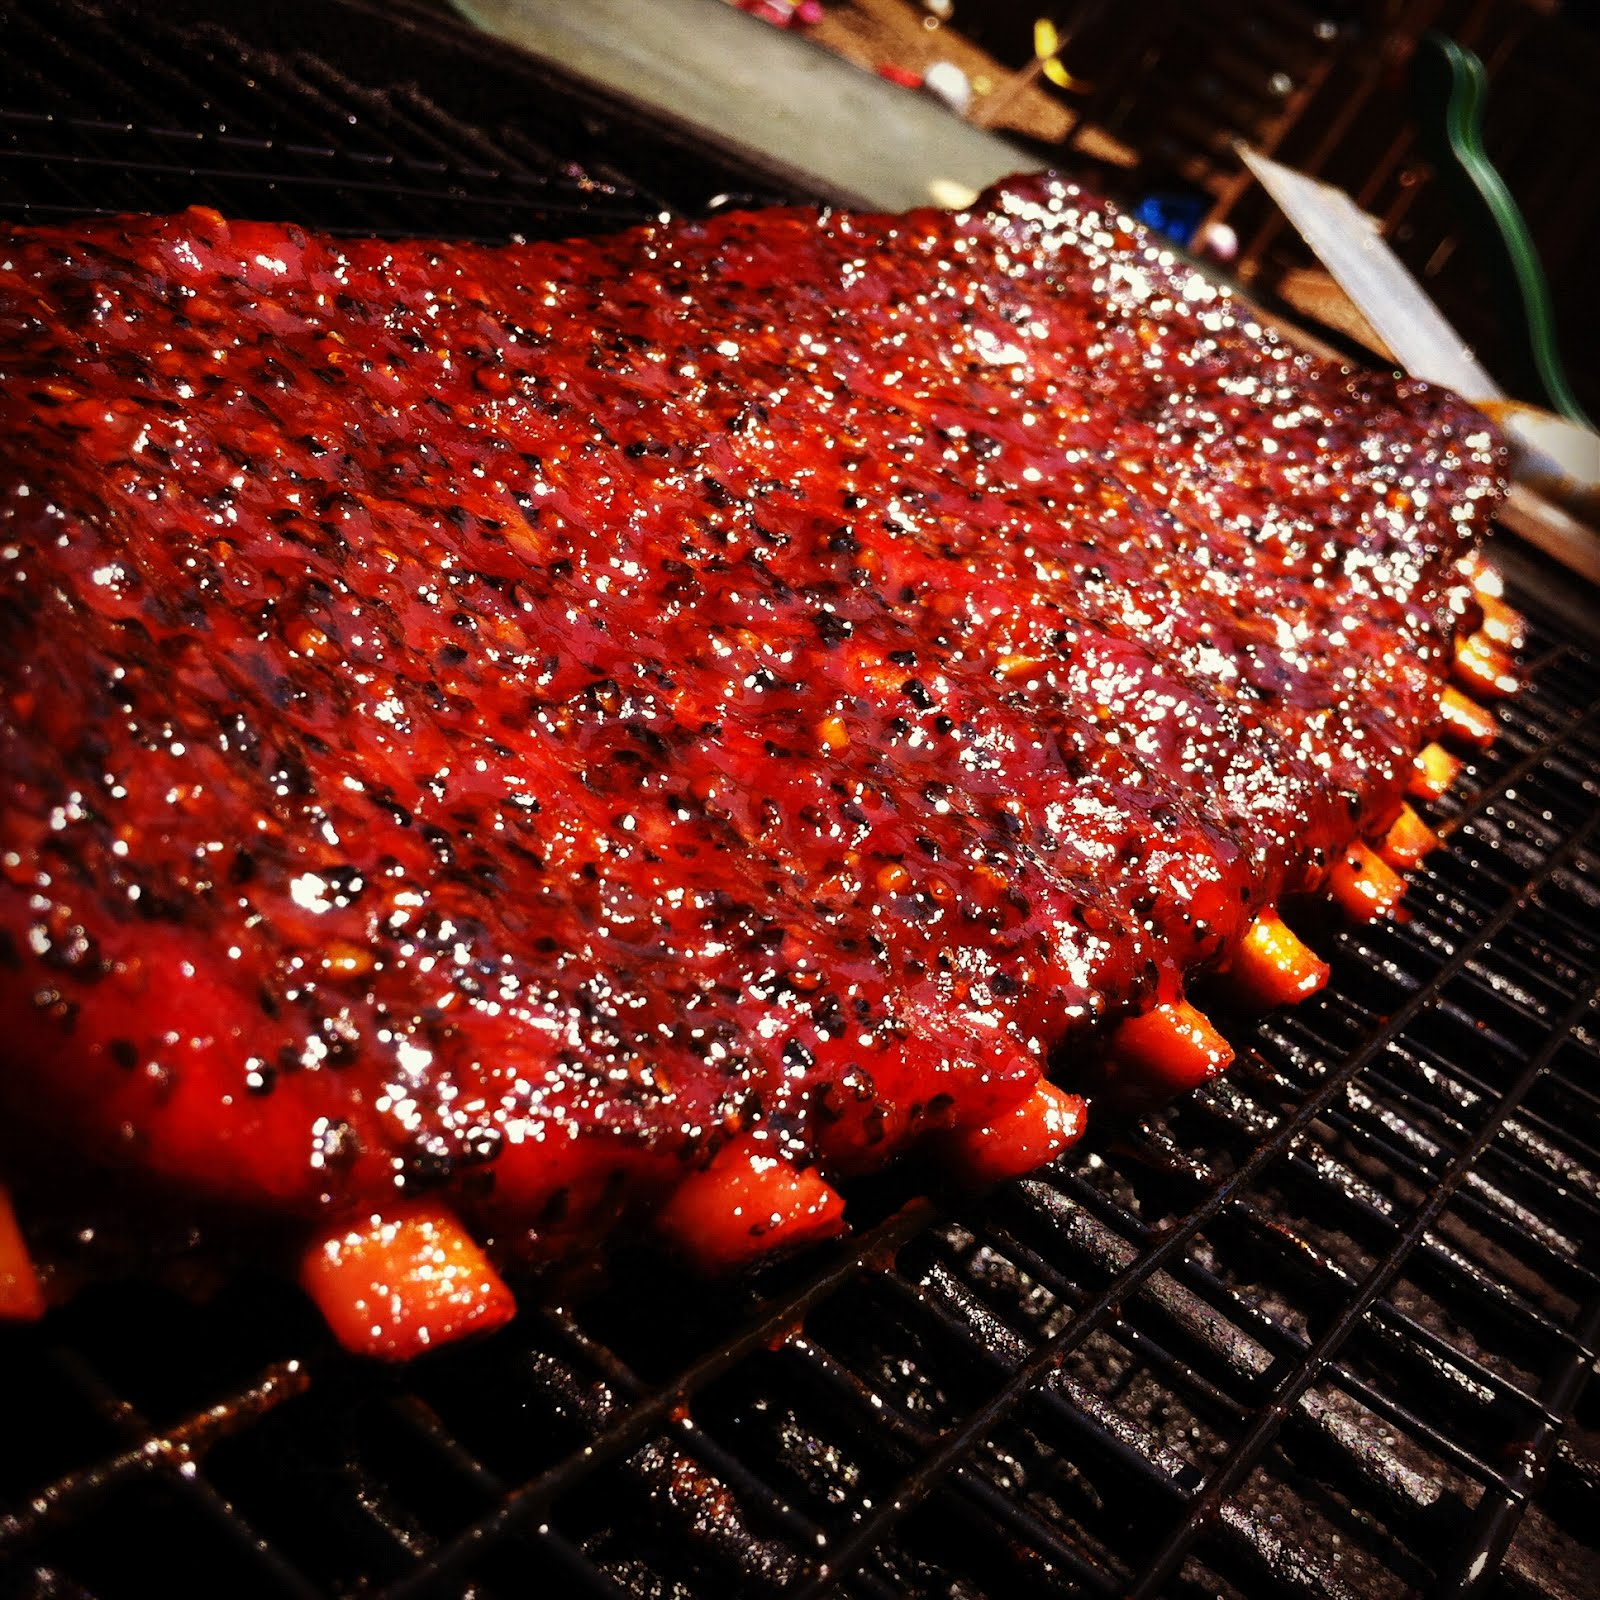 man up tales of texas bbq backyard bbq pork ribs chicken